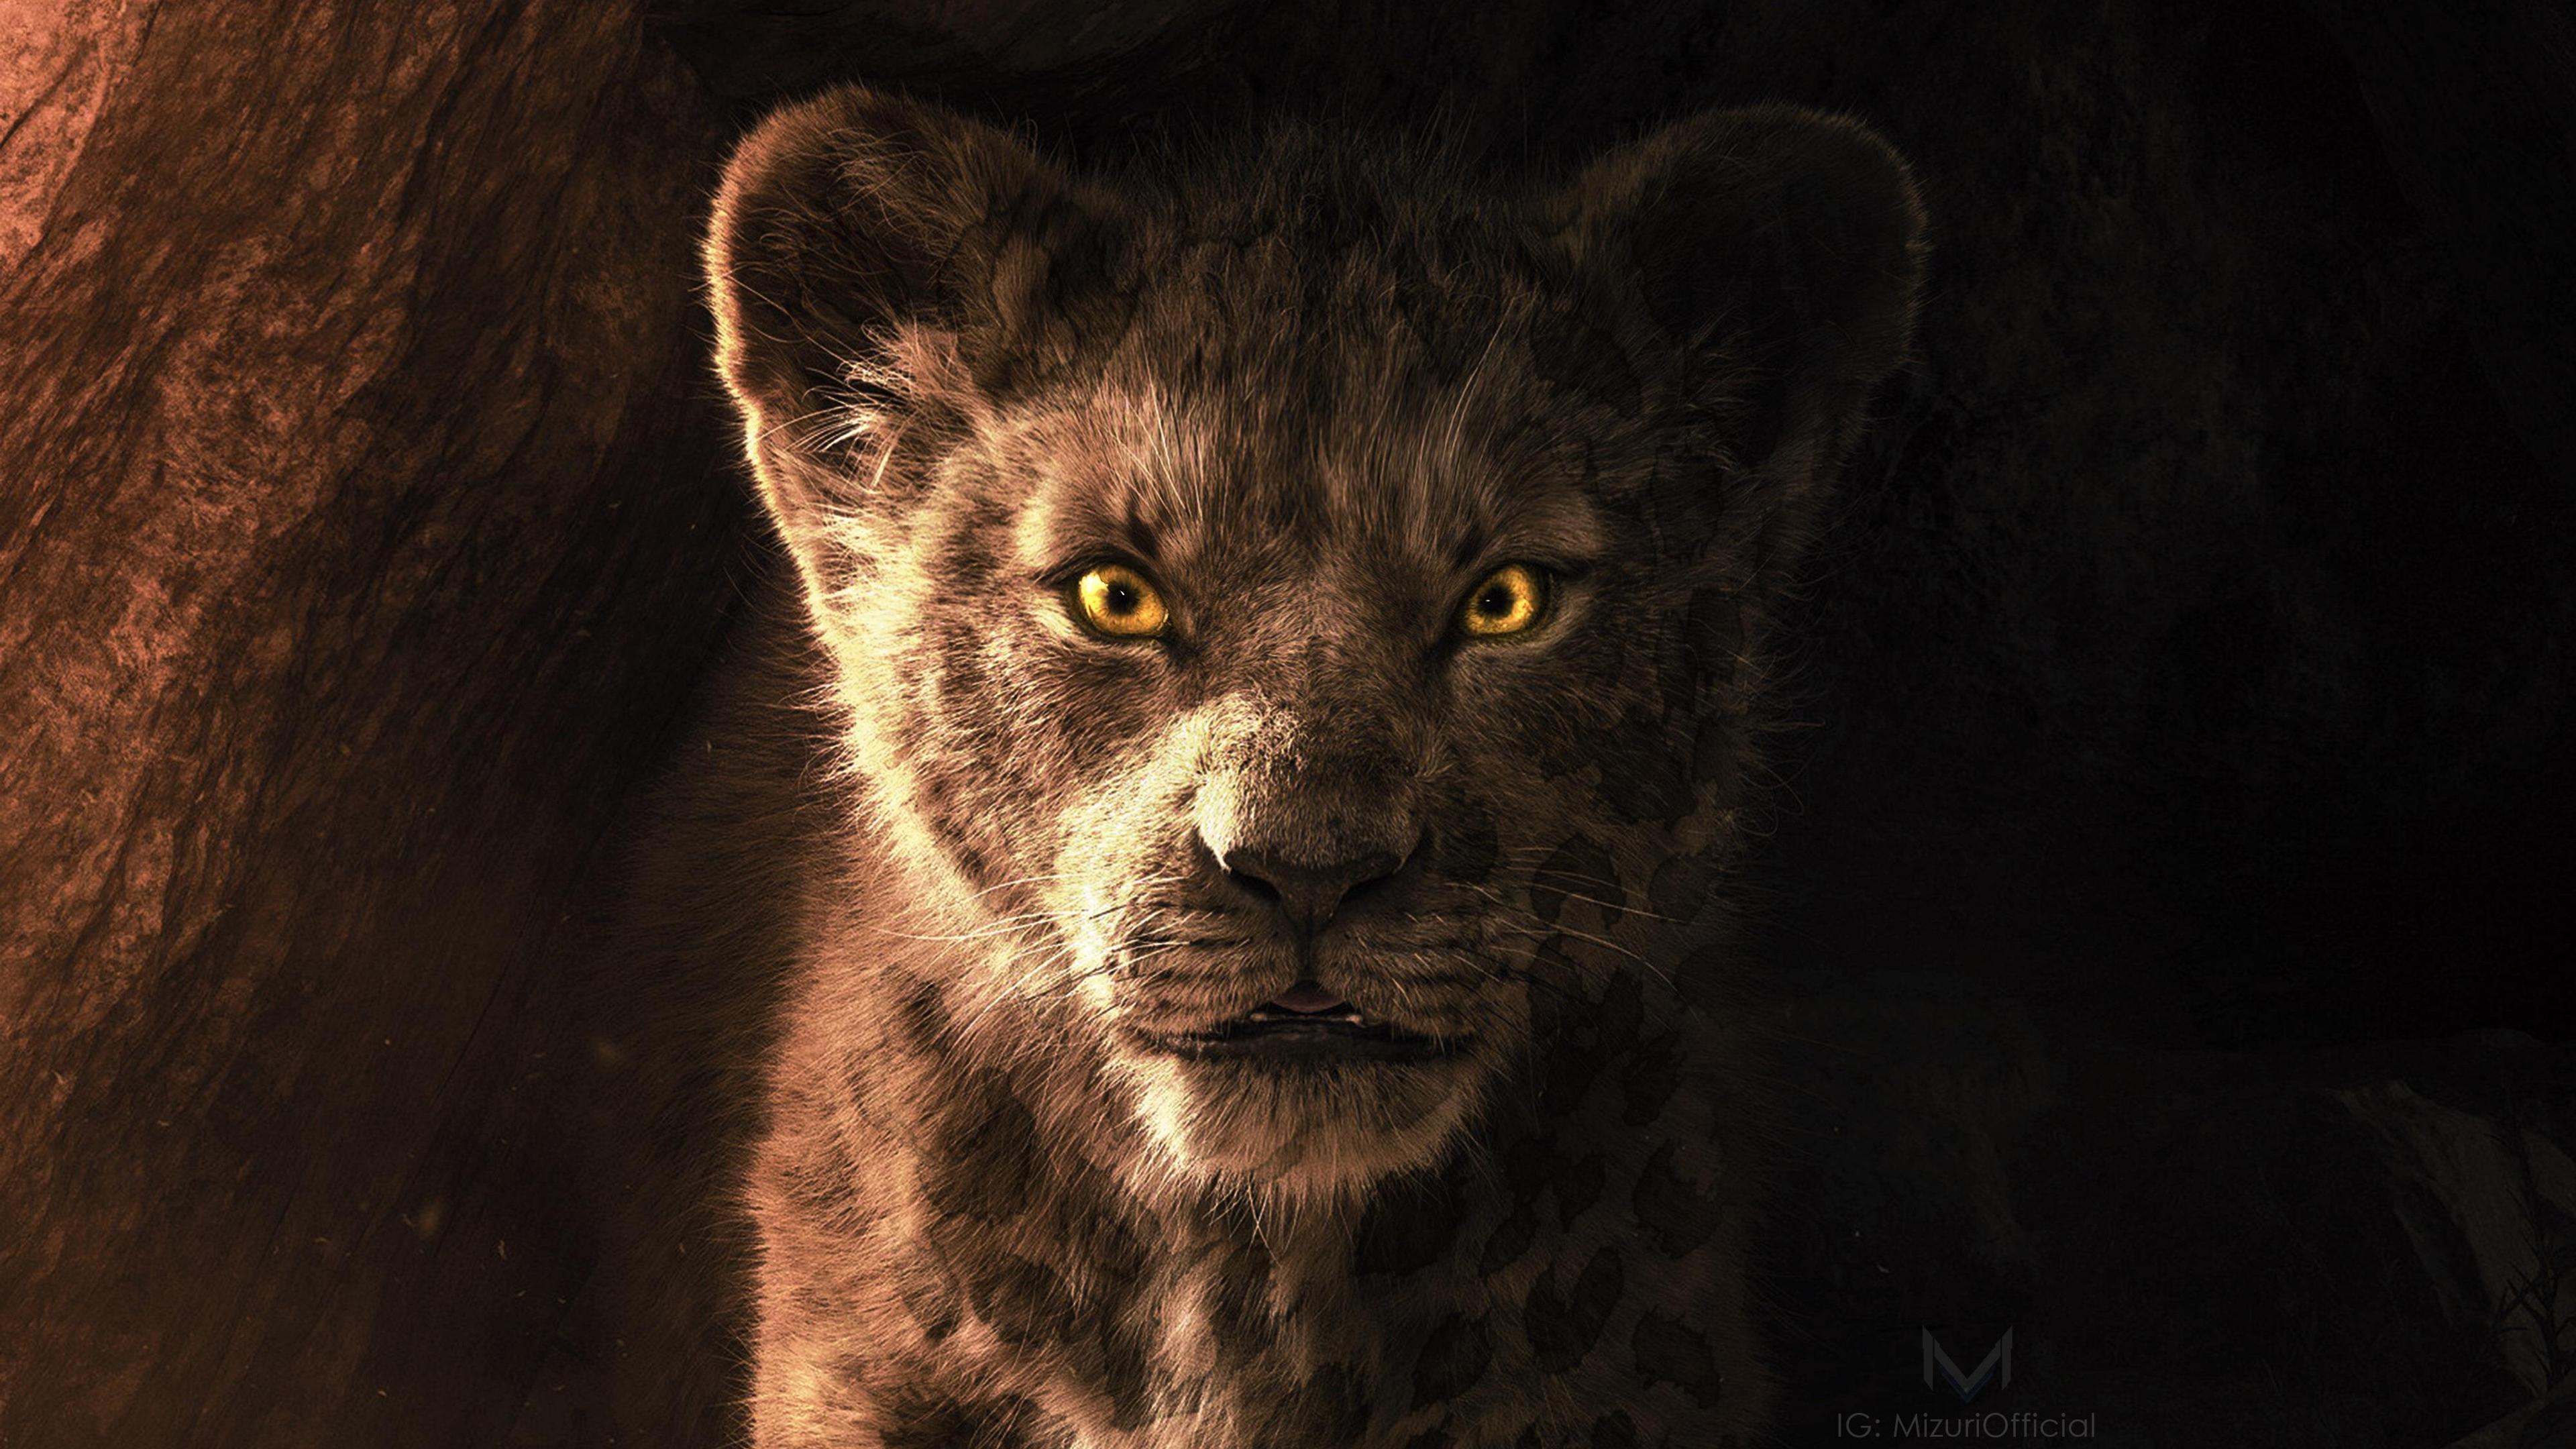 the lion king simba 9e 3840x2160 - The Lion King Simba 2019 4k - The lion king movie wallpapers hd 4k, Simba hd 4k wallpapers, Lion king simba hd 4k wallpapers